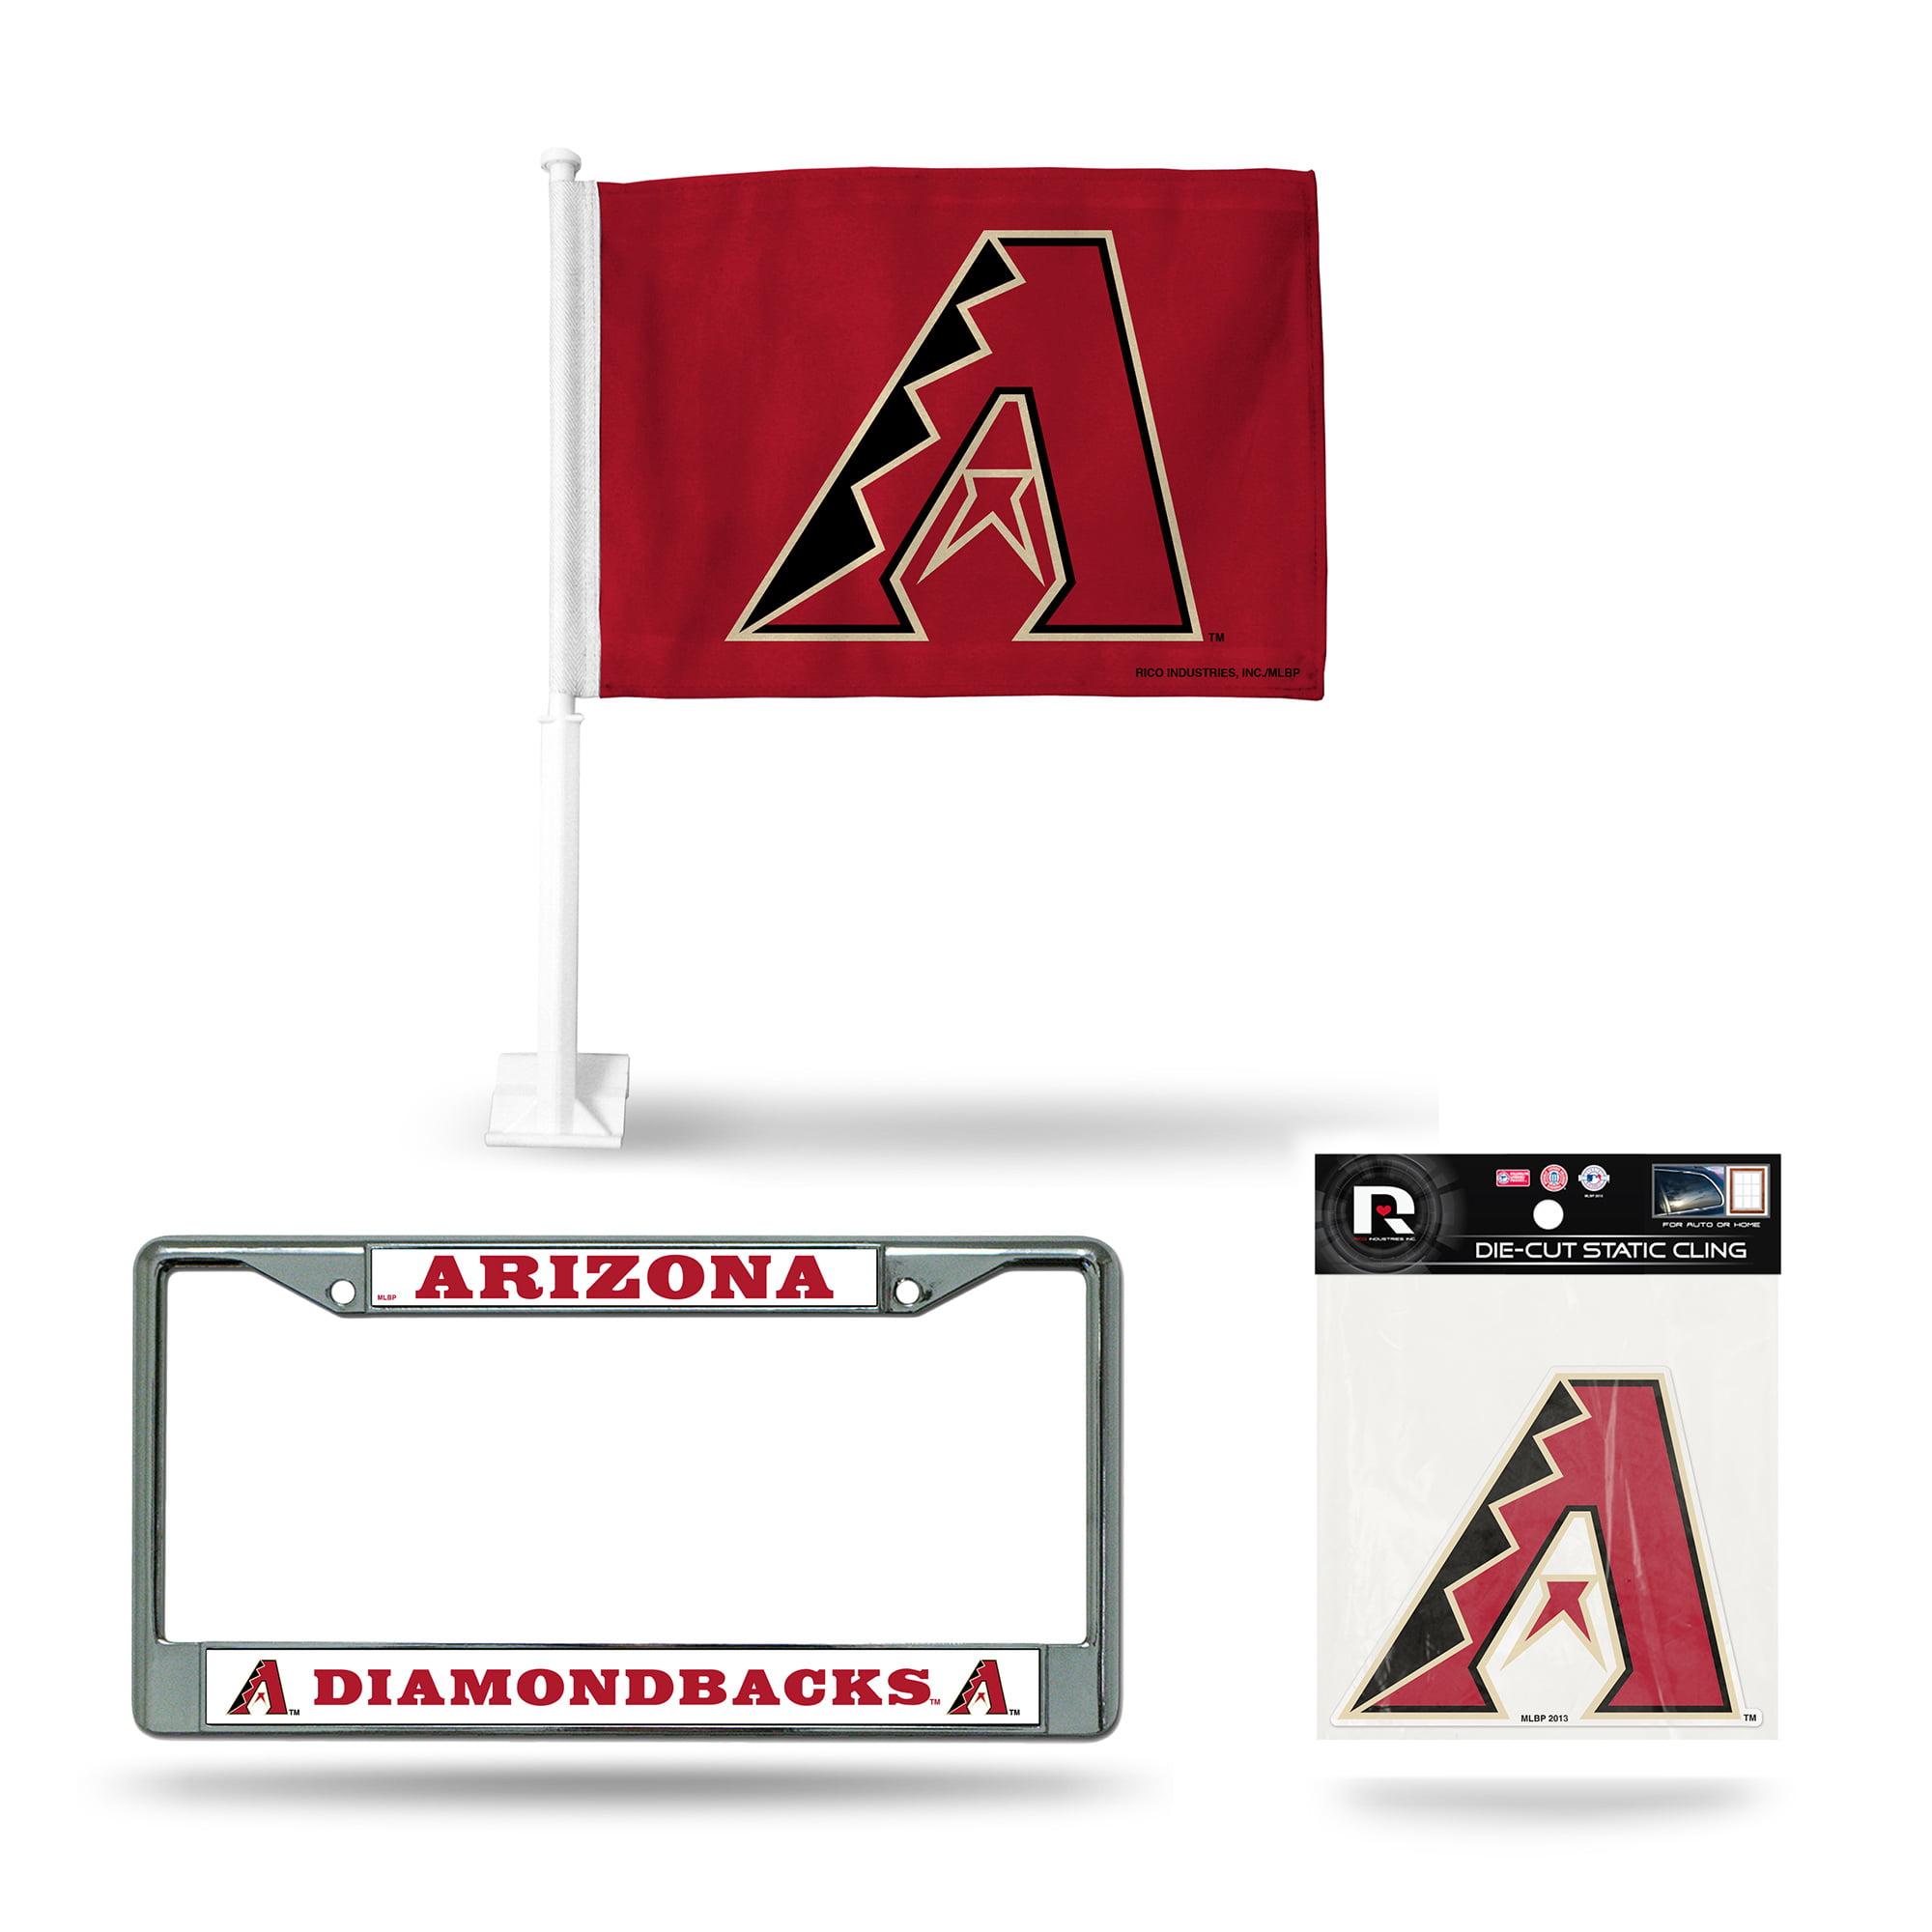 Arizona Diamondbacks Sparo Auto Pack - No Size